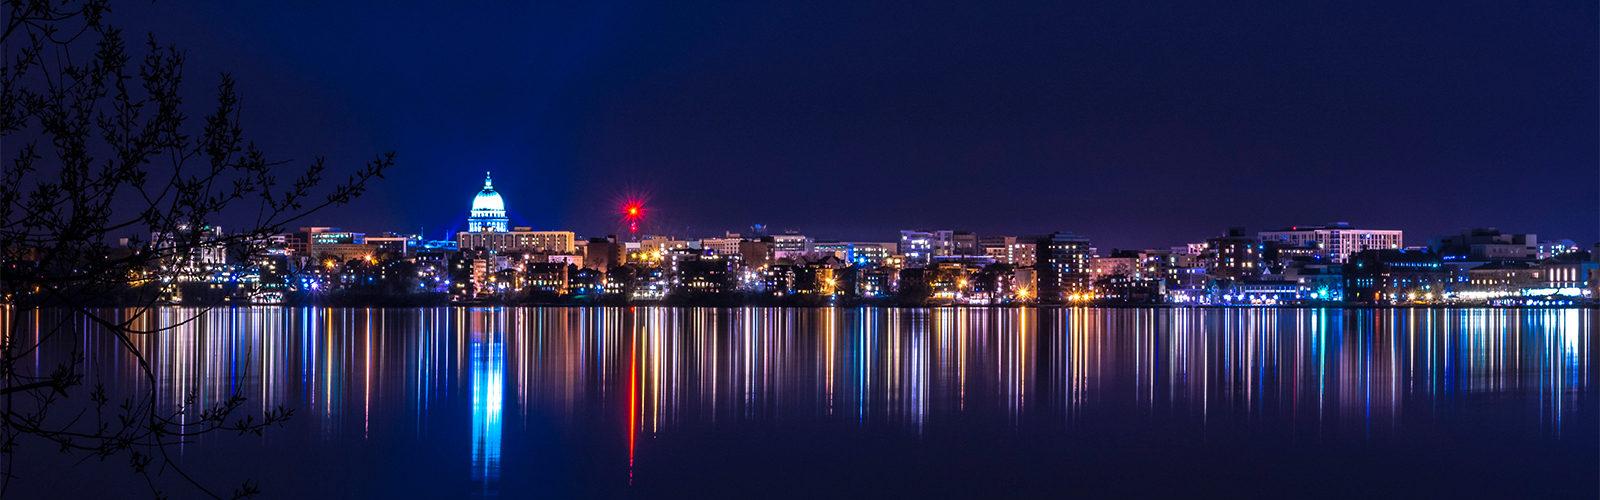 Madison, Wisconsin Skyline